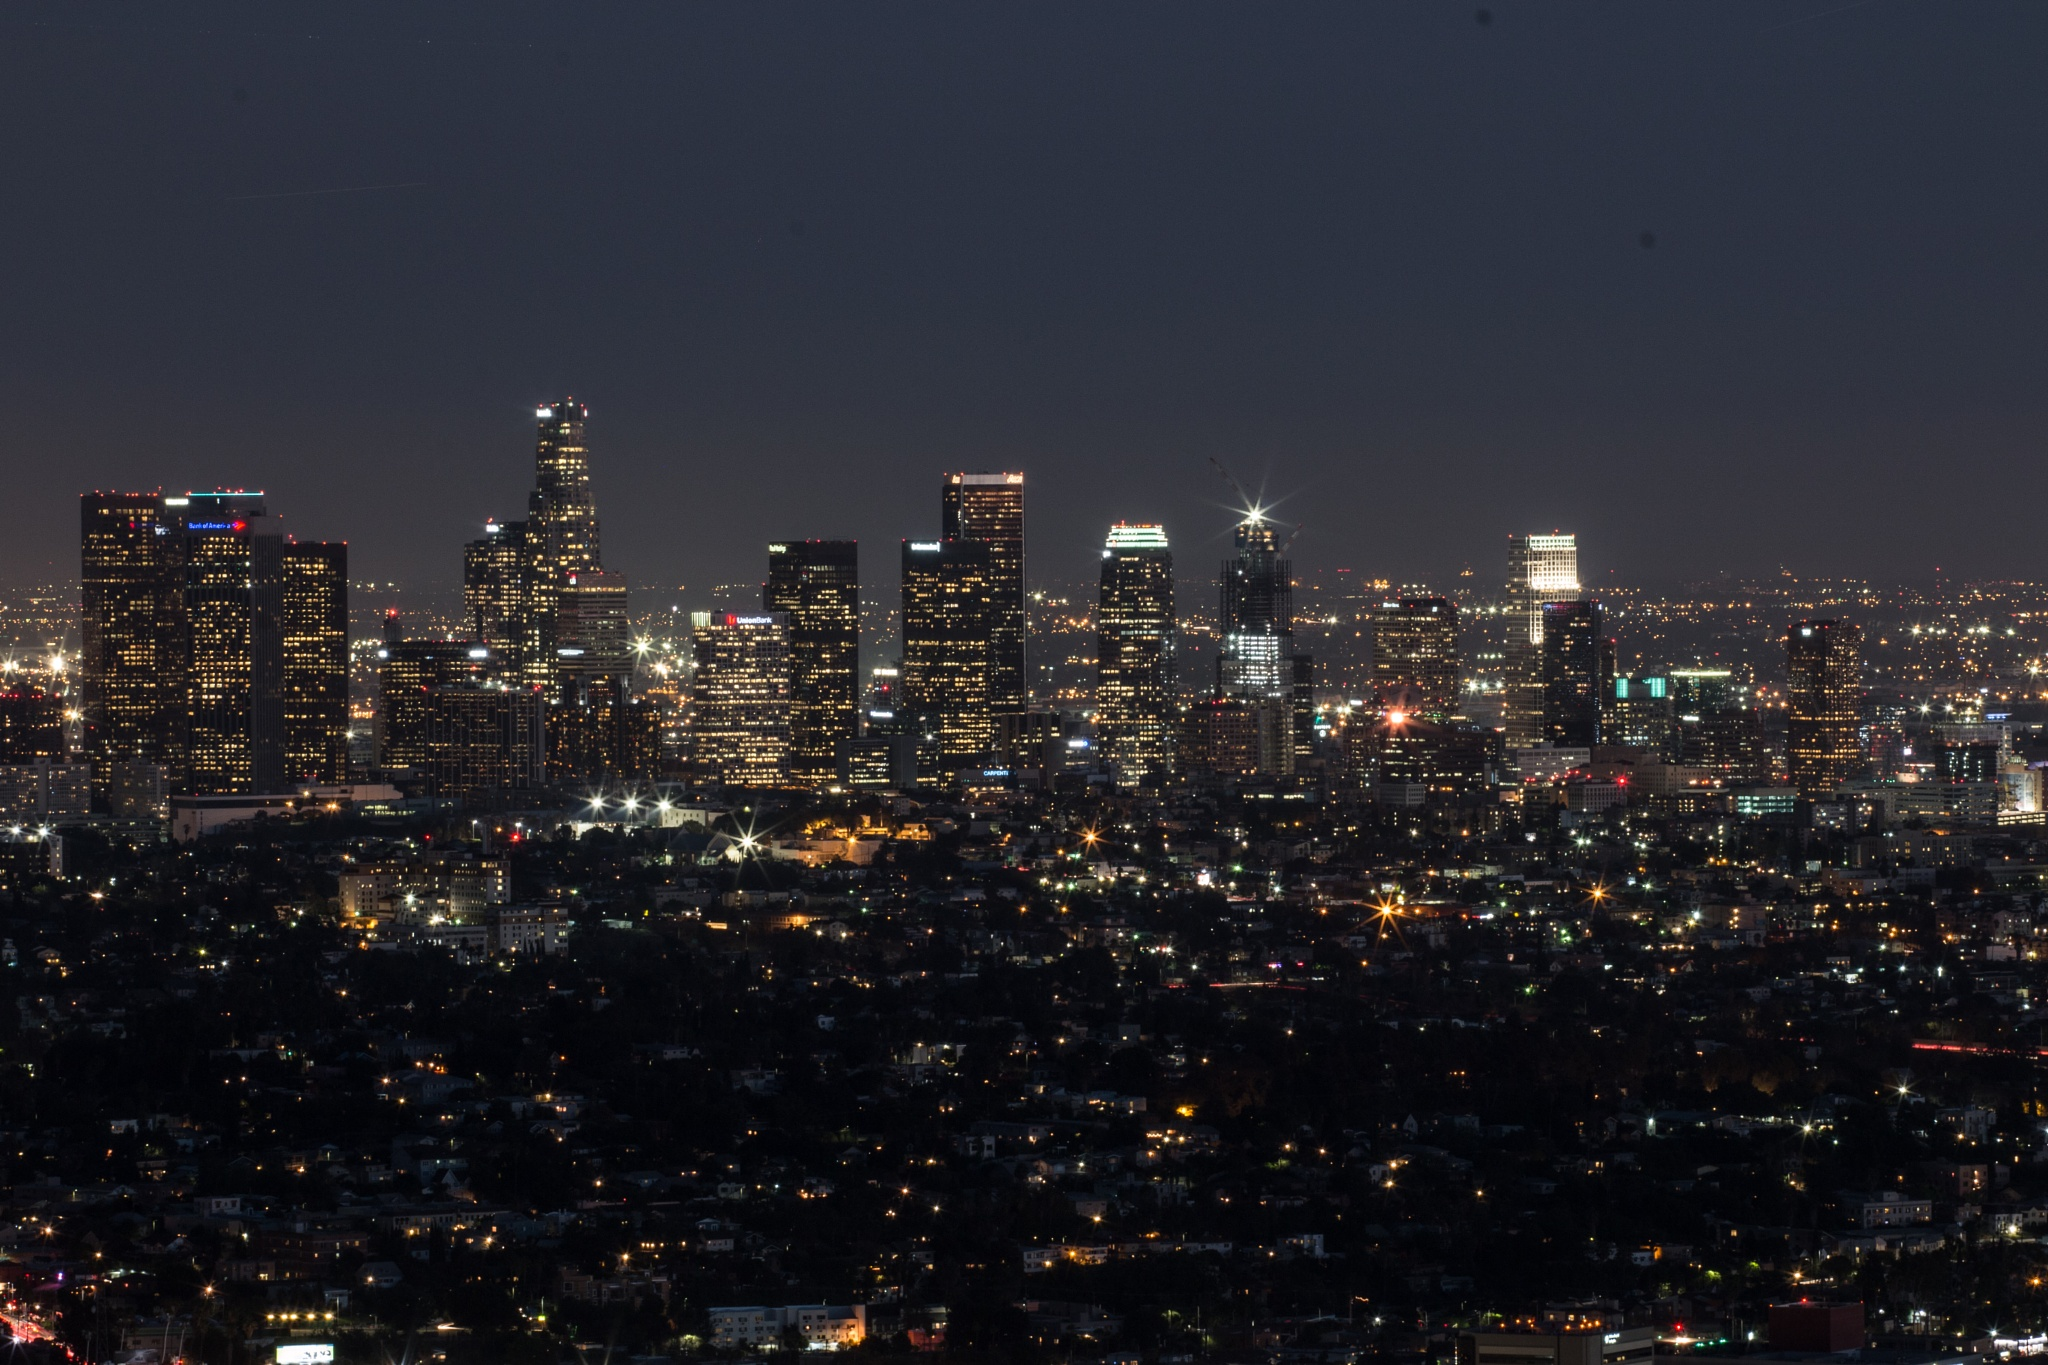 L.A. skyline by Tonally Fabela